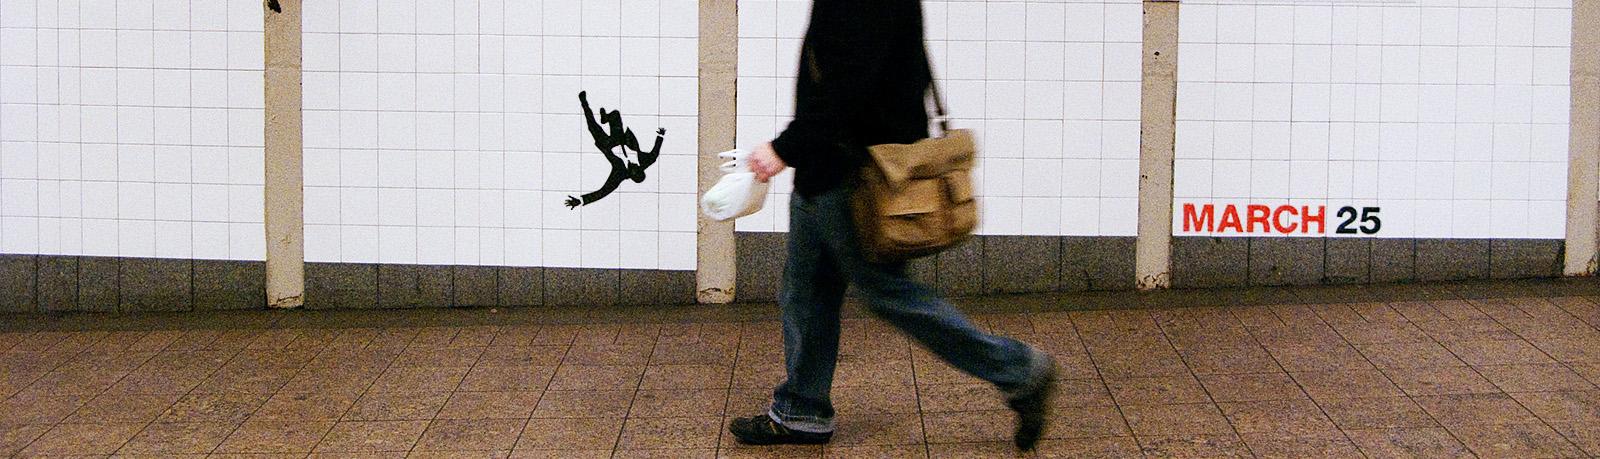 mad-mefn-subway